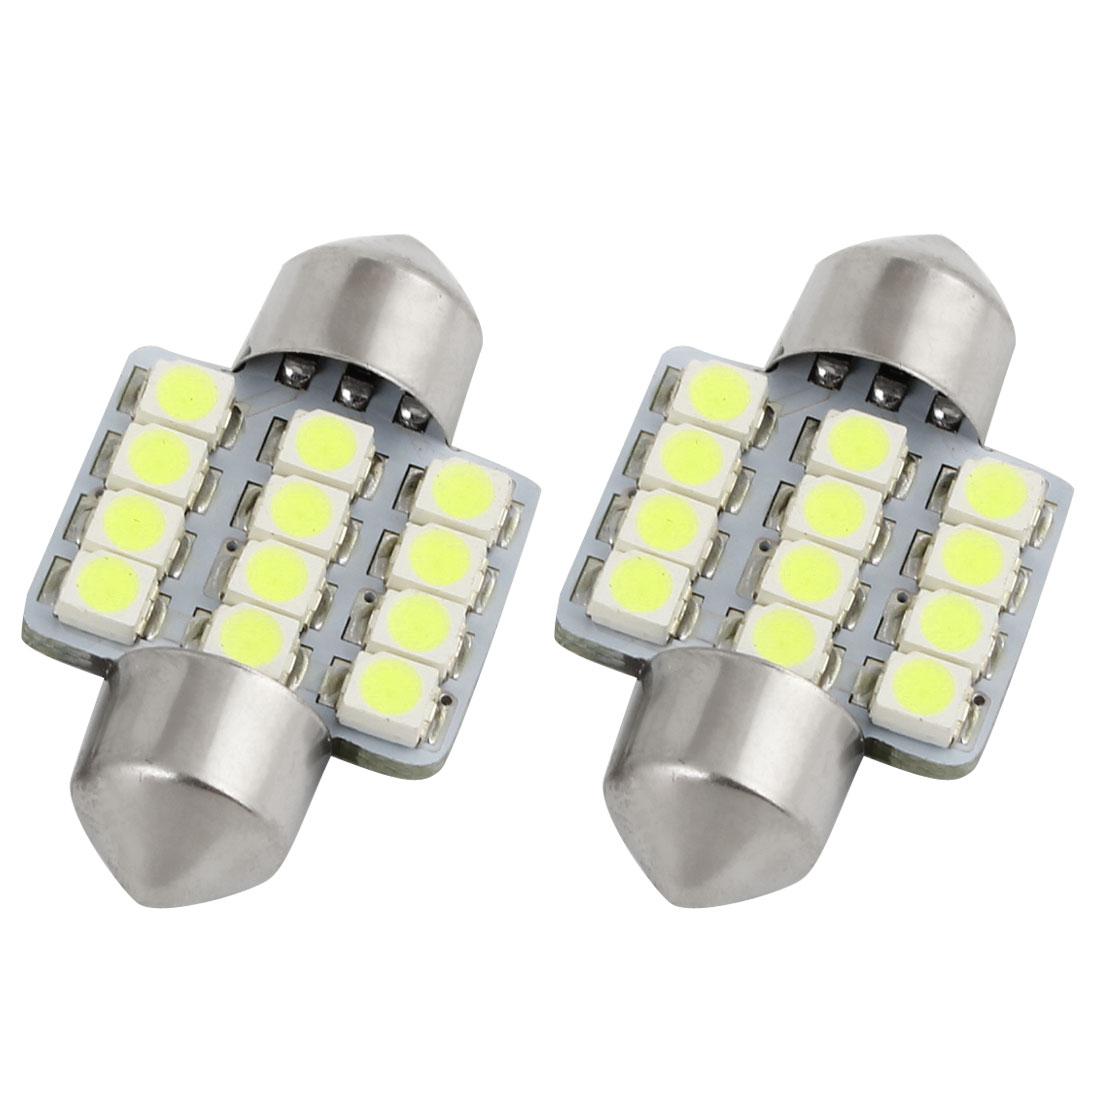 2 X White 31MM 12SMD Festoon Dome Map Interior LED Light Lamp DE3175 3022 3021